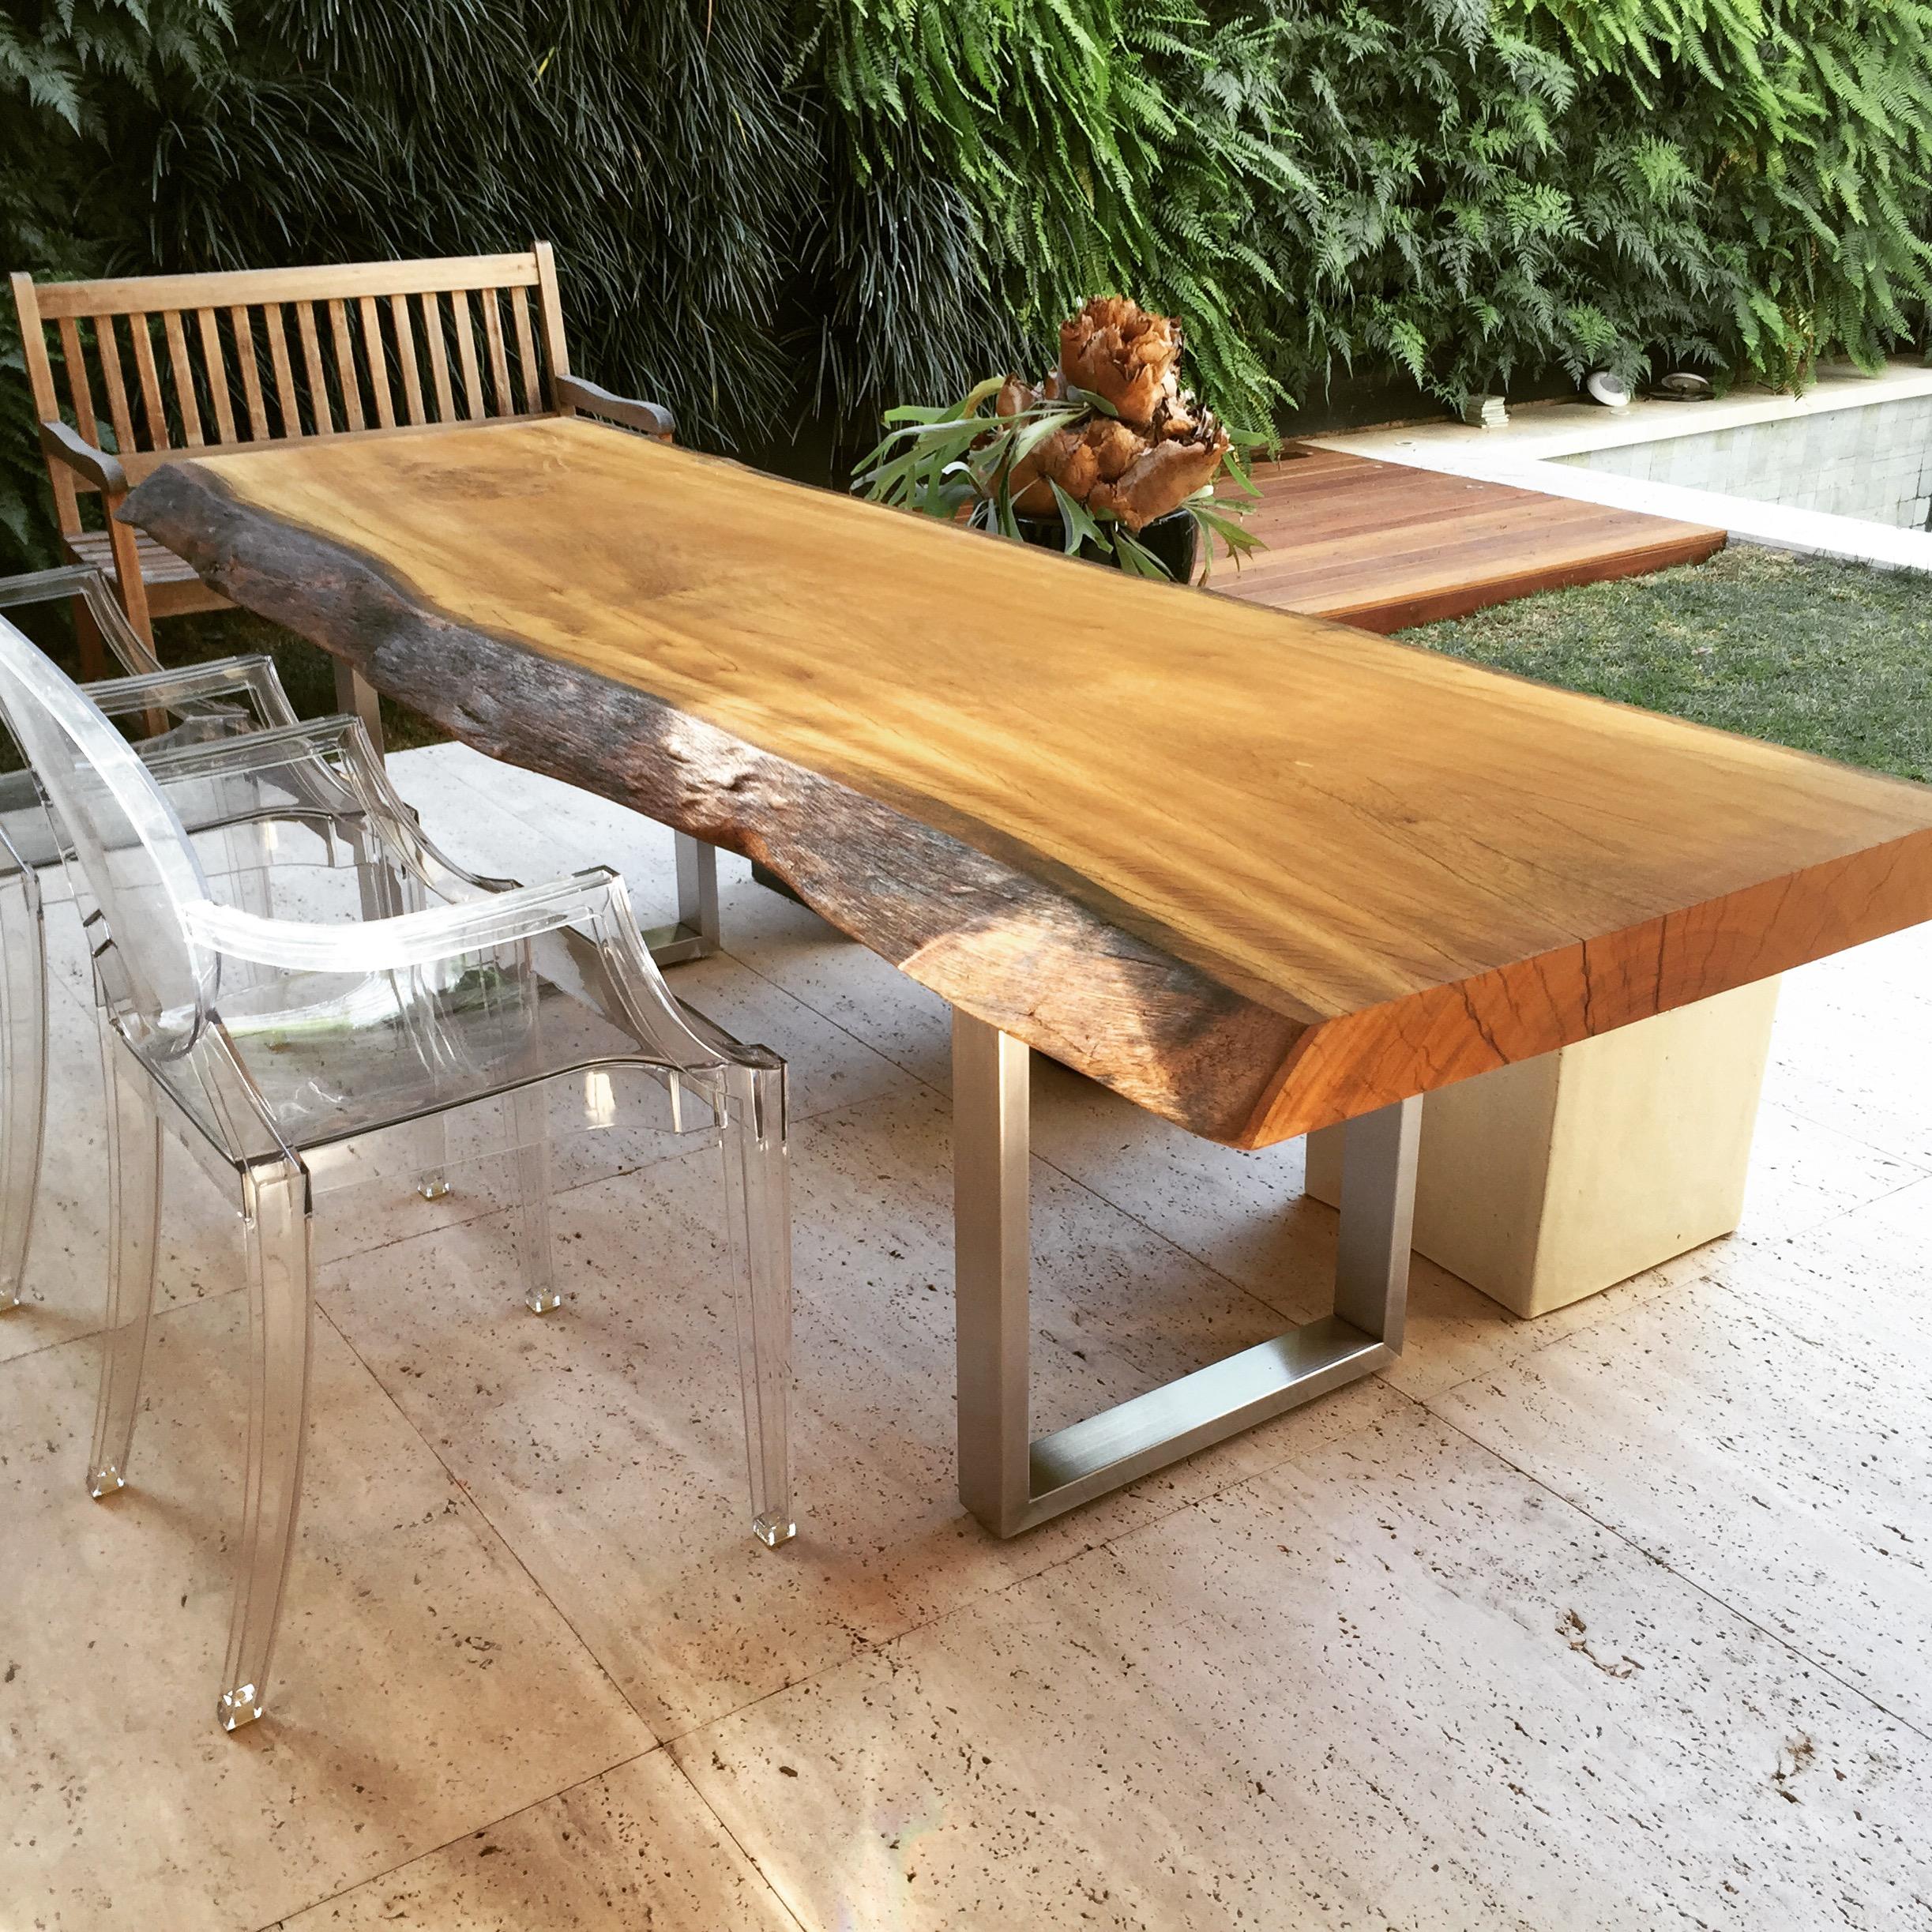 Mesa de Jantar com pés Metálicos